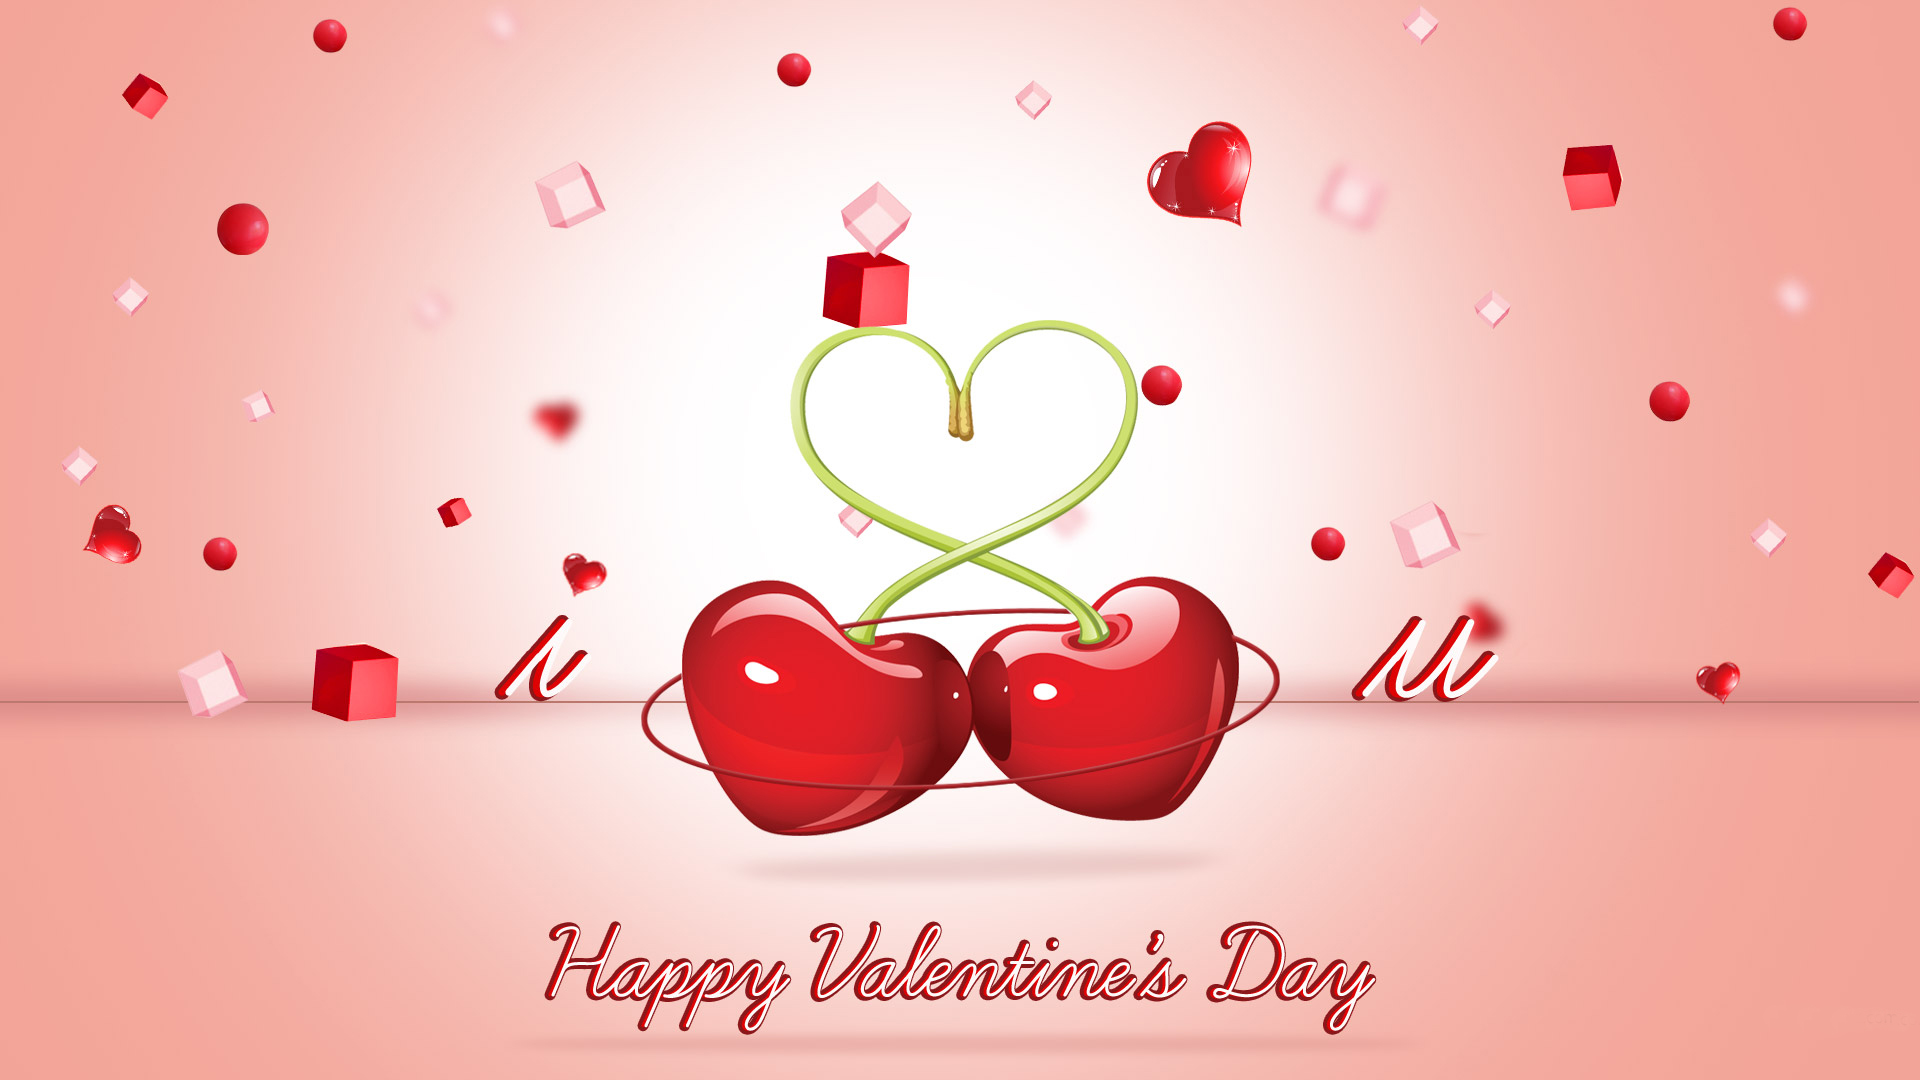 Valentine Wallpaper Desktop - WallpaperSafari